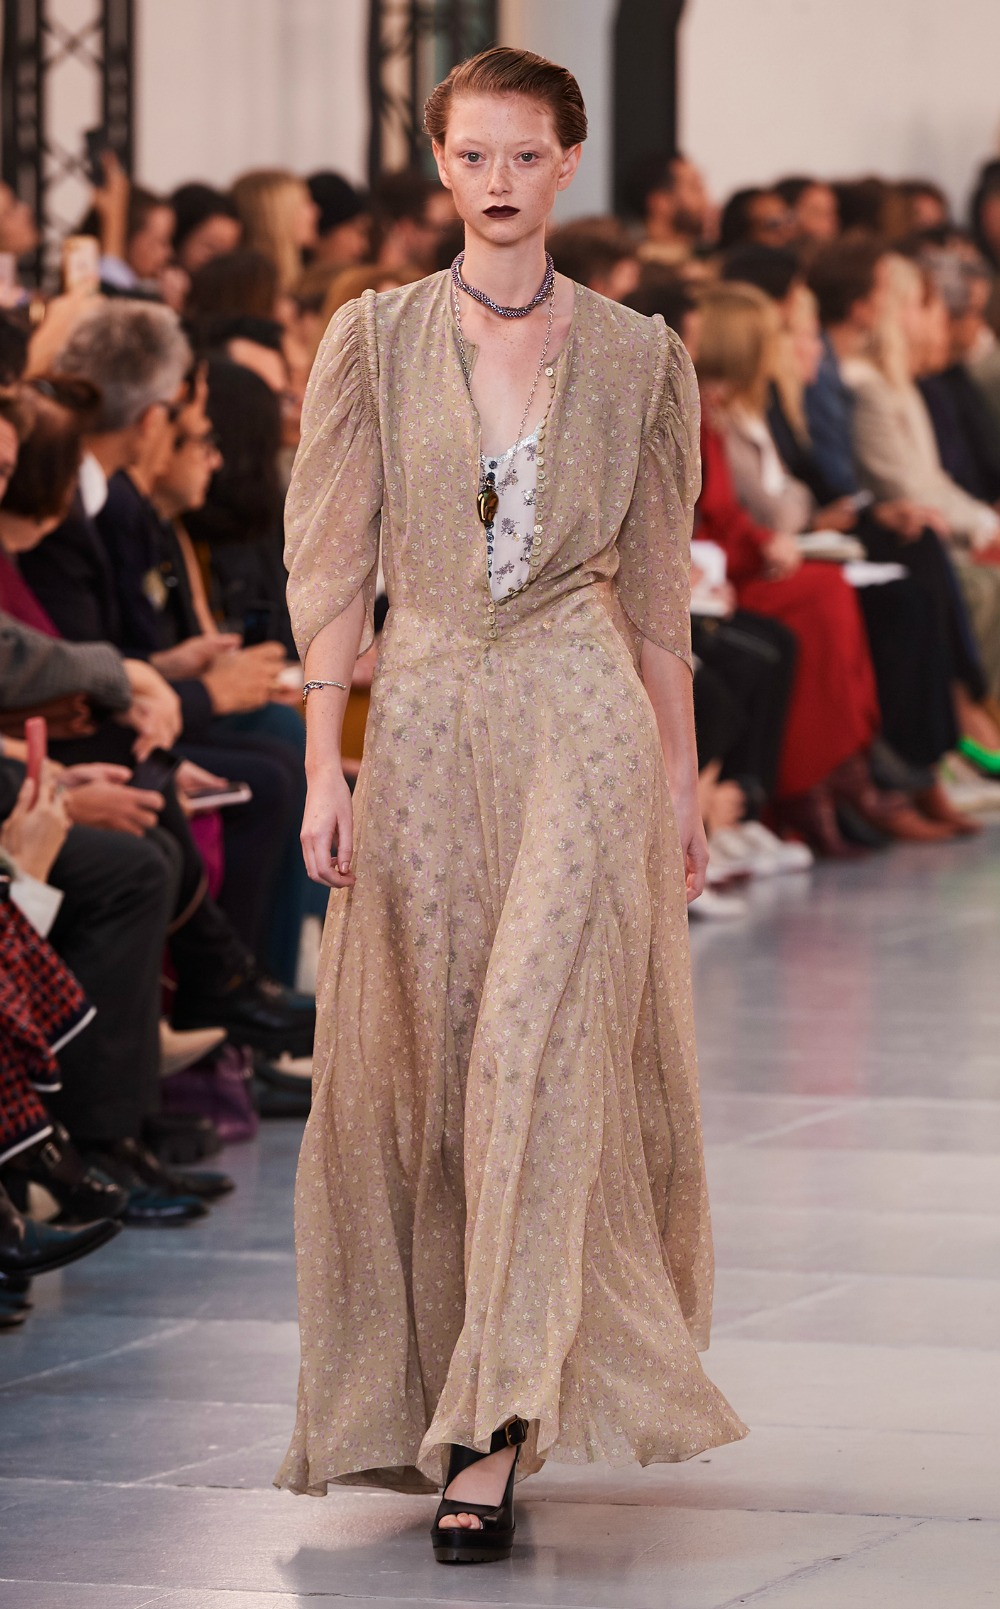 Chloe Spring 2020 Collection Runway at Paris Fashion Week #FashionWeek #HighFashion #DEsignerFashion #Chloe